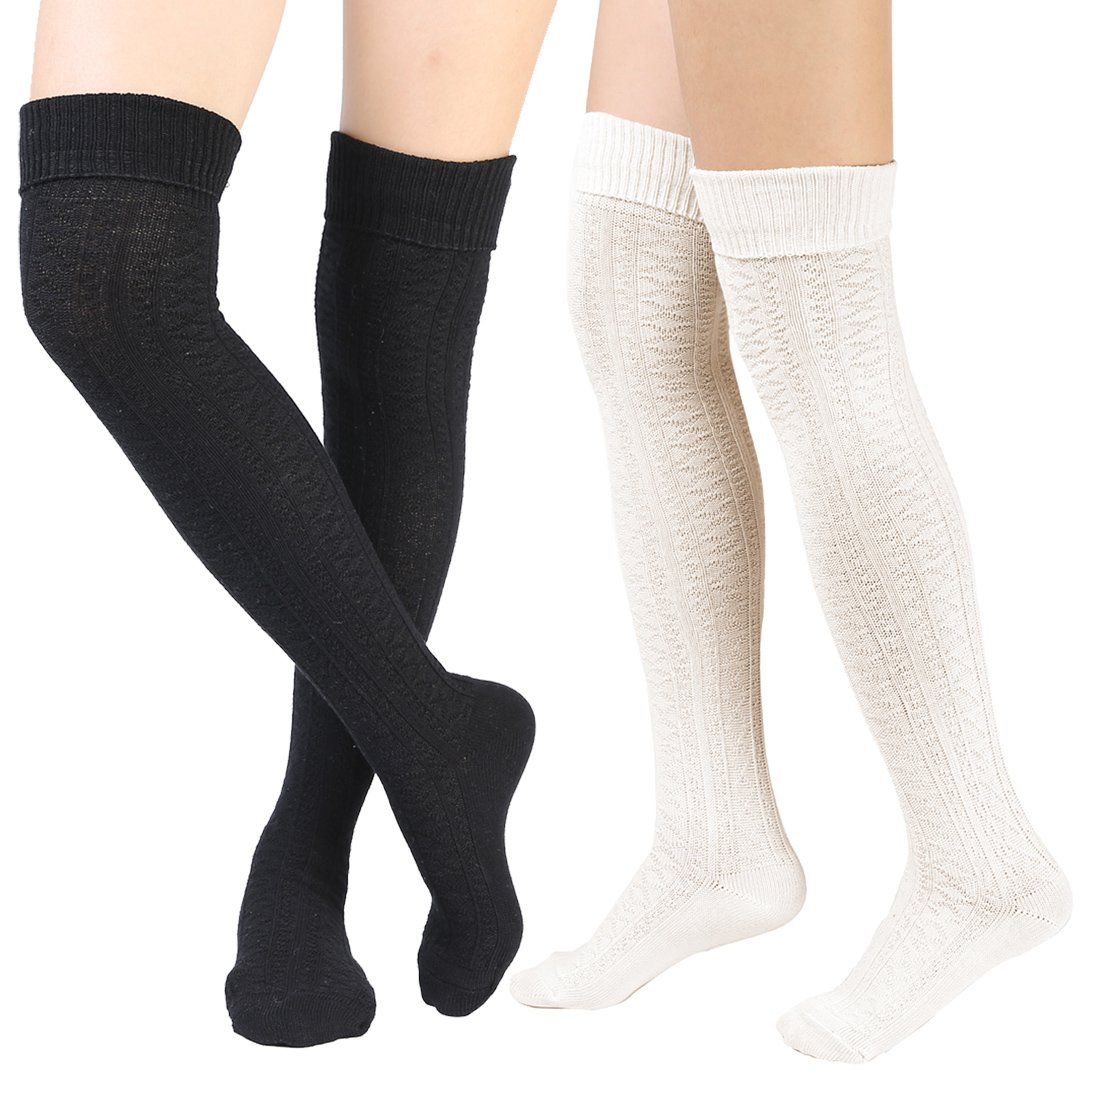 Women's Over Knee High Socks Knit Boot Stockings Leg Warmer 2 Pairs